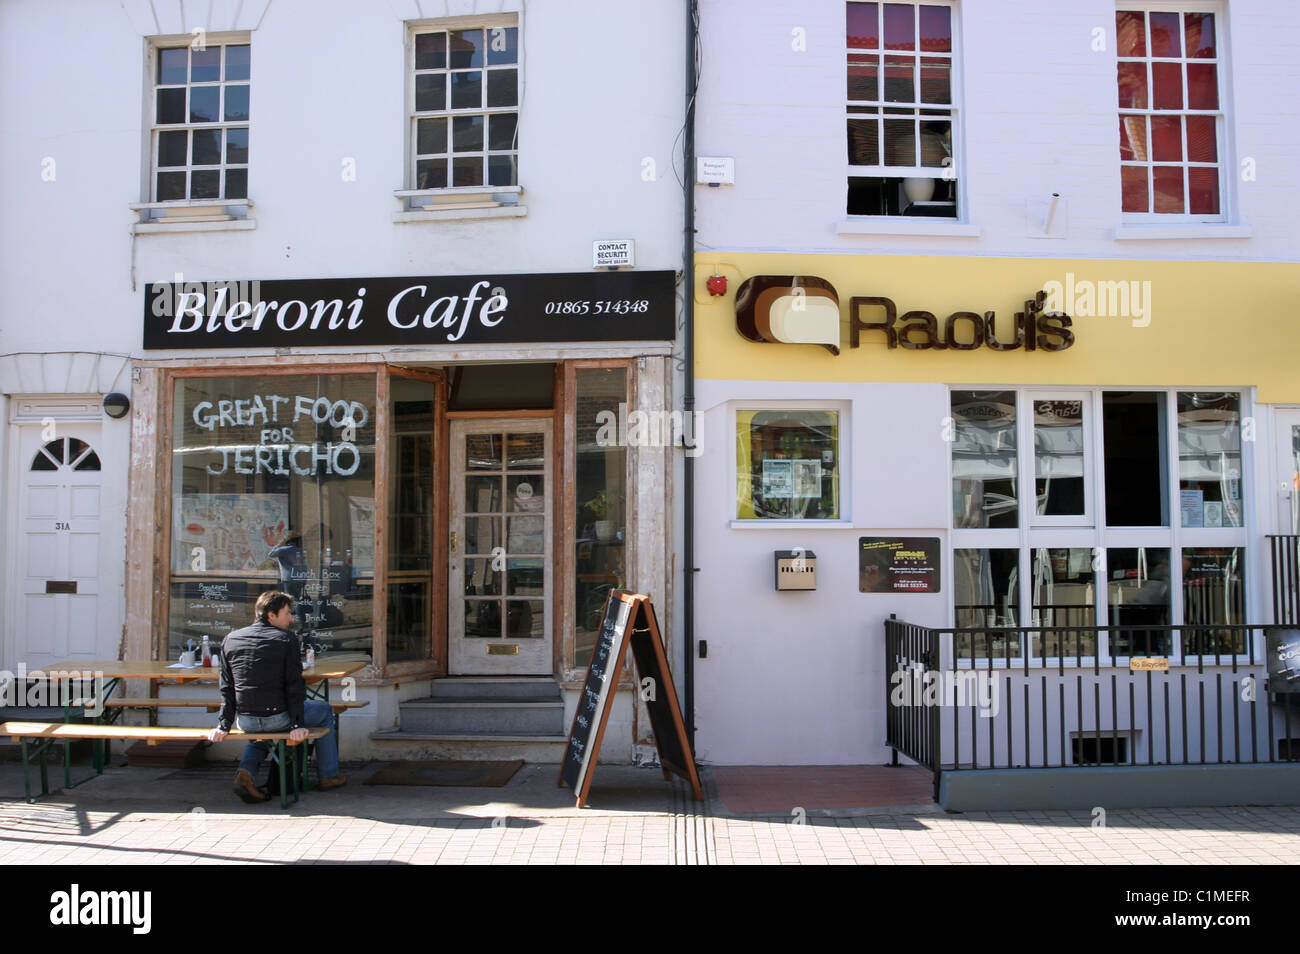 Bleroni Cafe, Jericho, Oxford - Stock Image